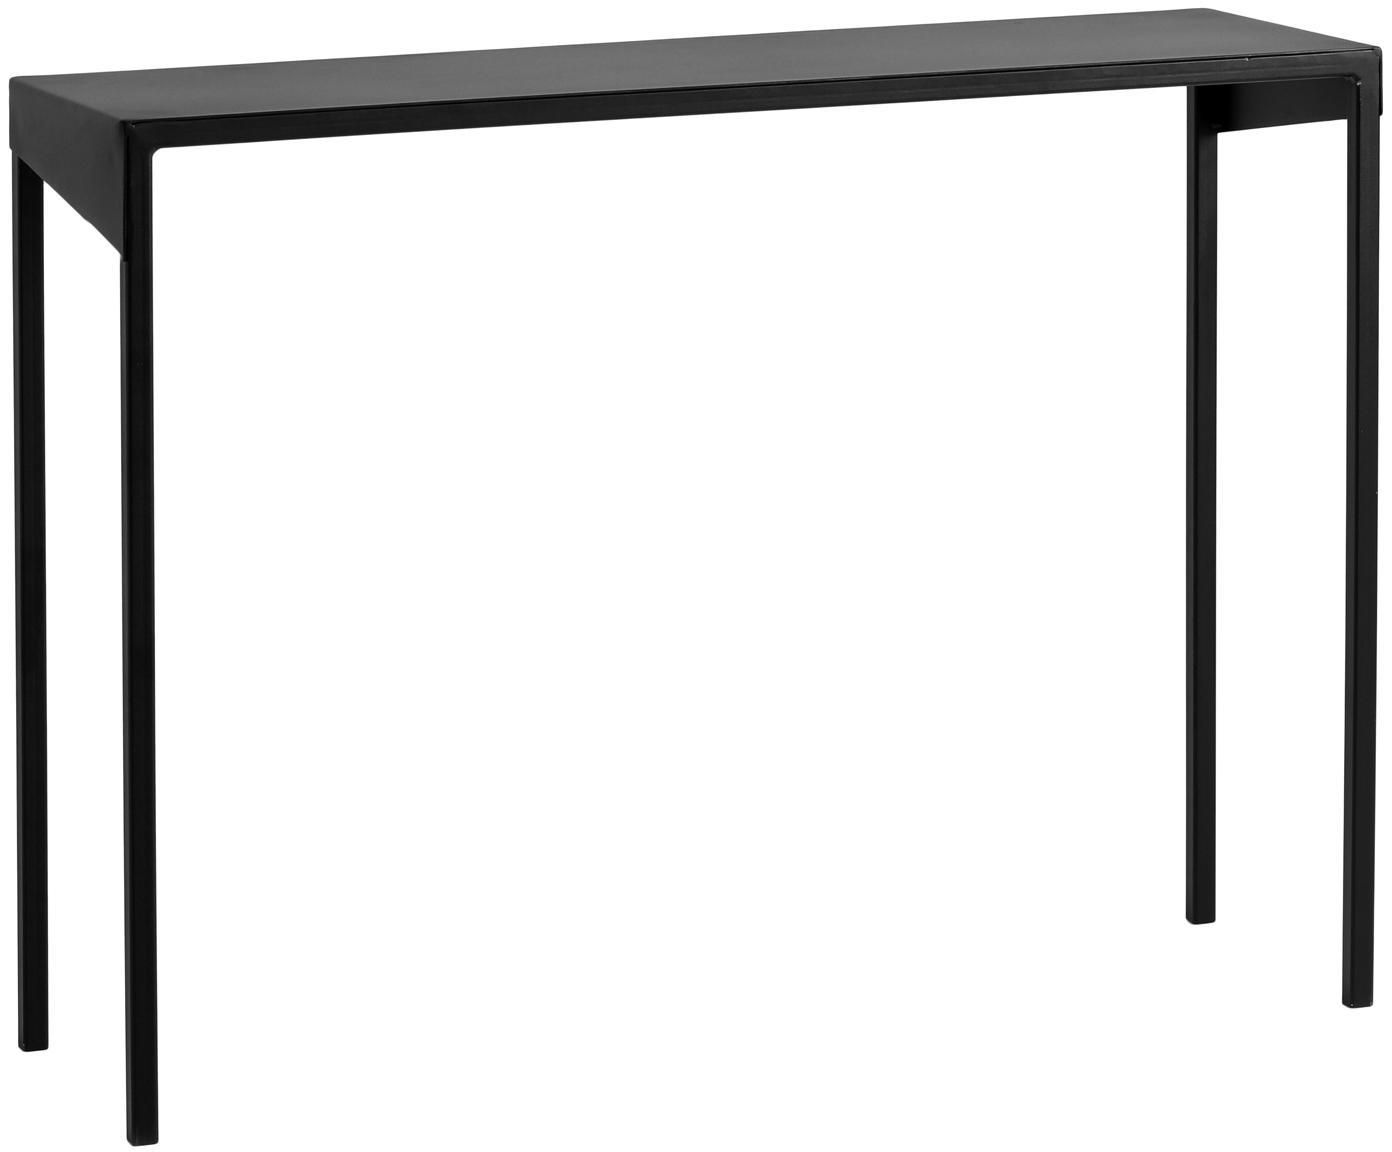 Sidetable Obroos in zwart, Gelakt metaal, Zwart, 100 x 75 cm